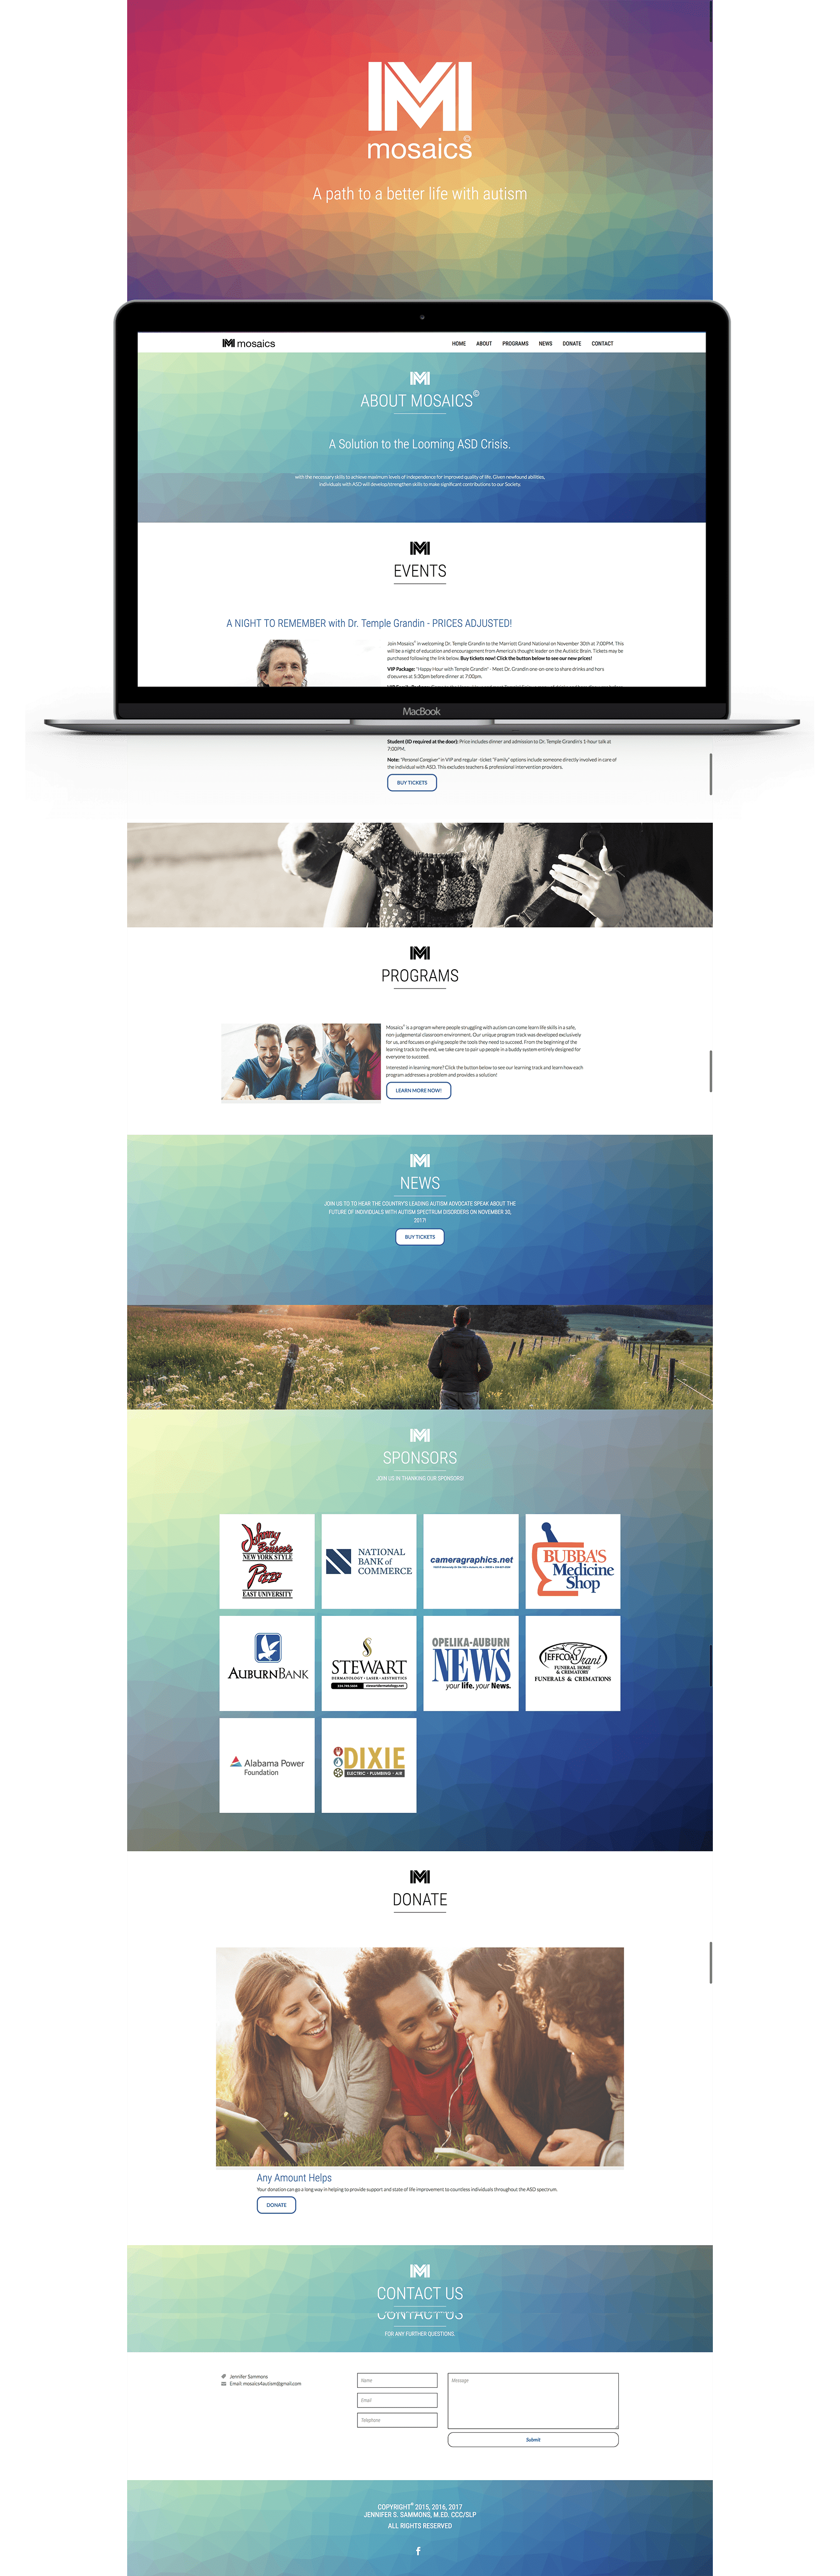 Mosaics website